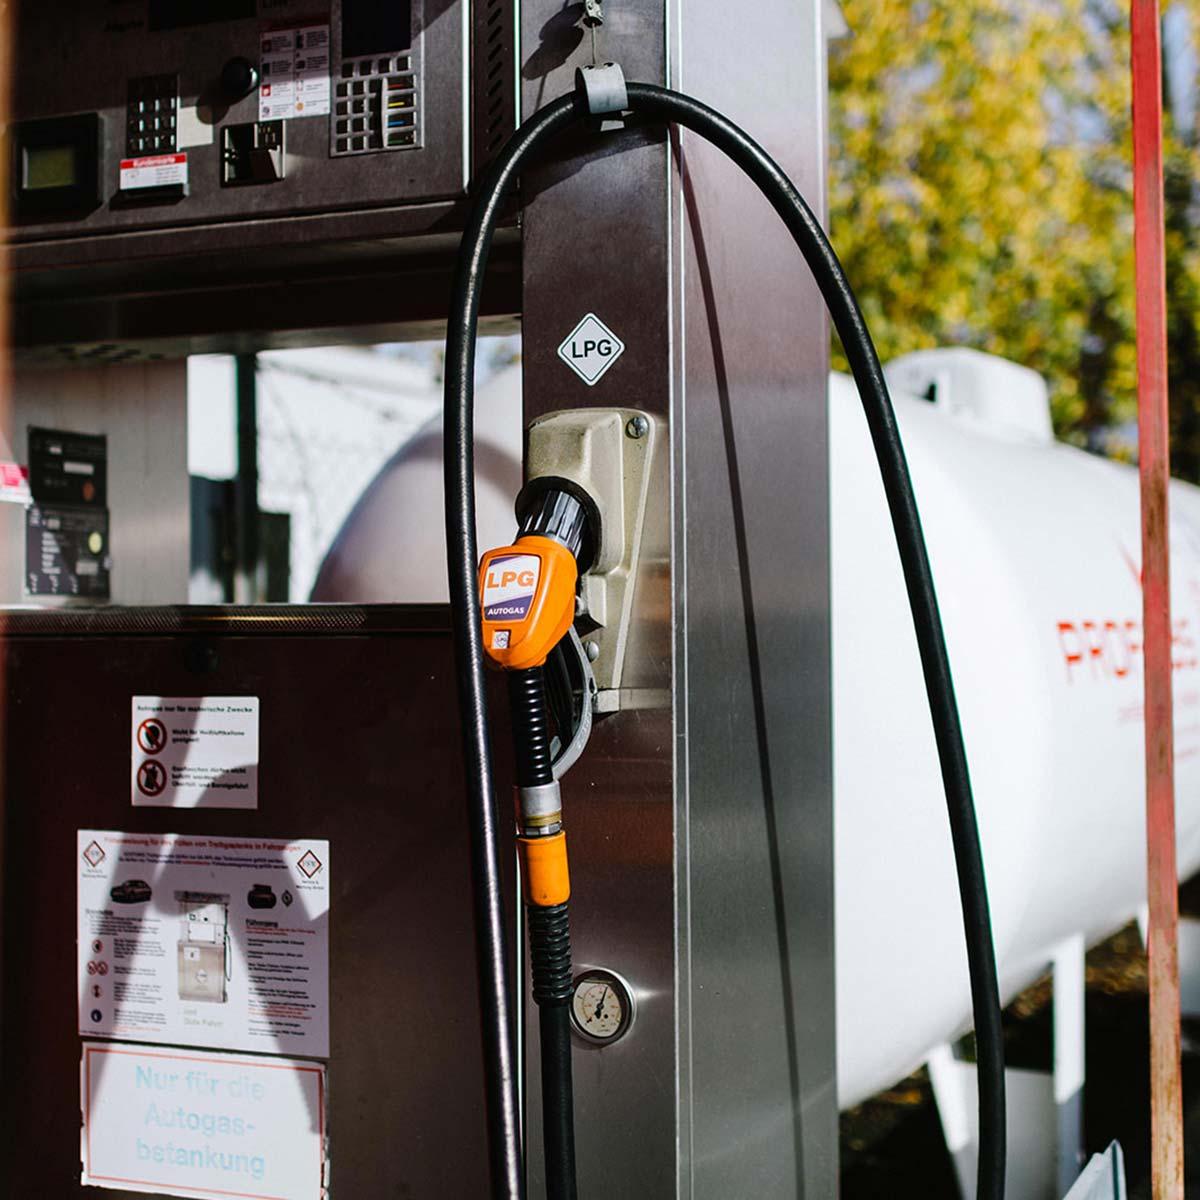 Autogas Tankstelle von Profigas